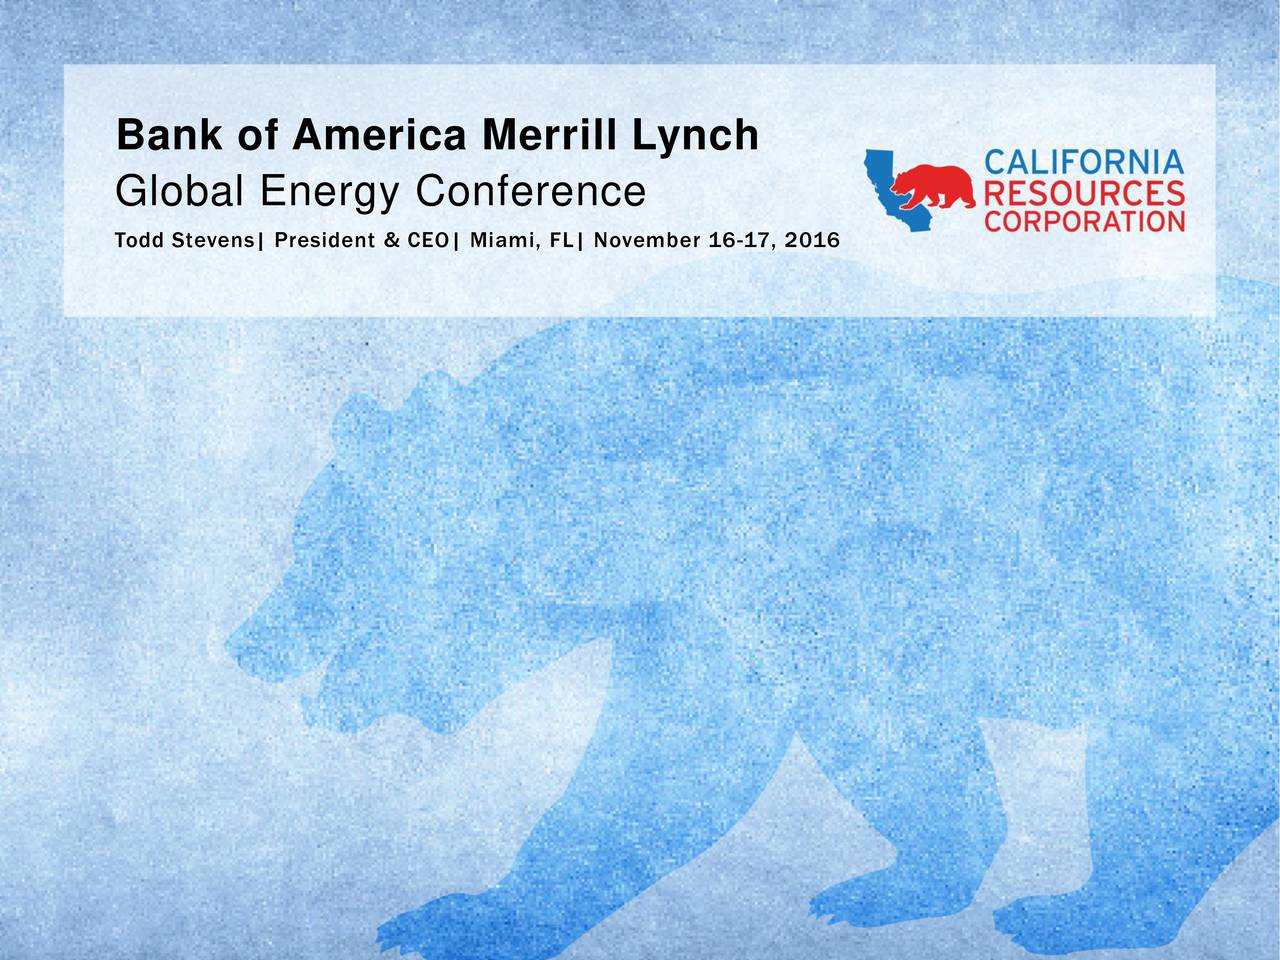 Global Energy Conference Todd Stevens| President & CEO| Miami, FL| November 16-17, 2016